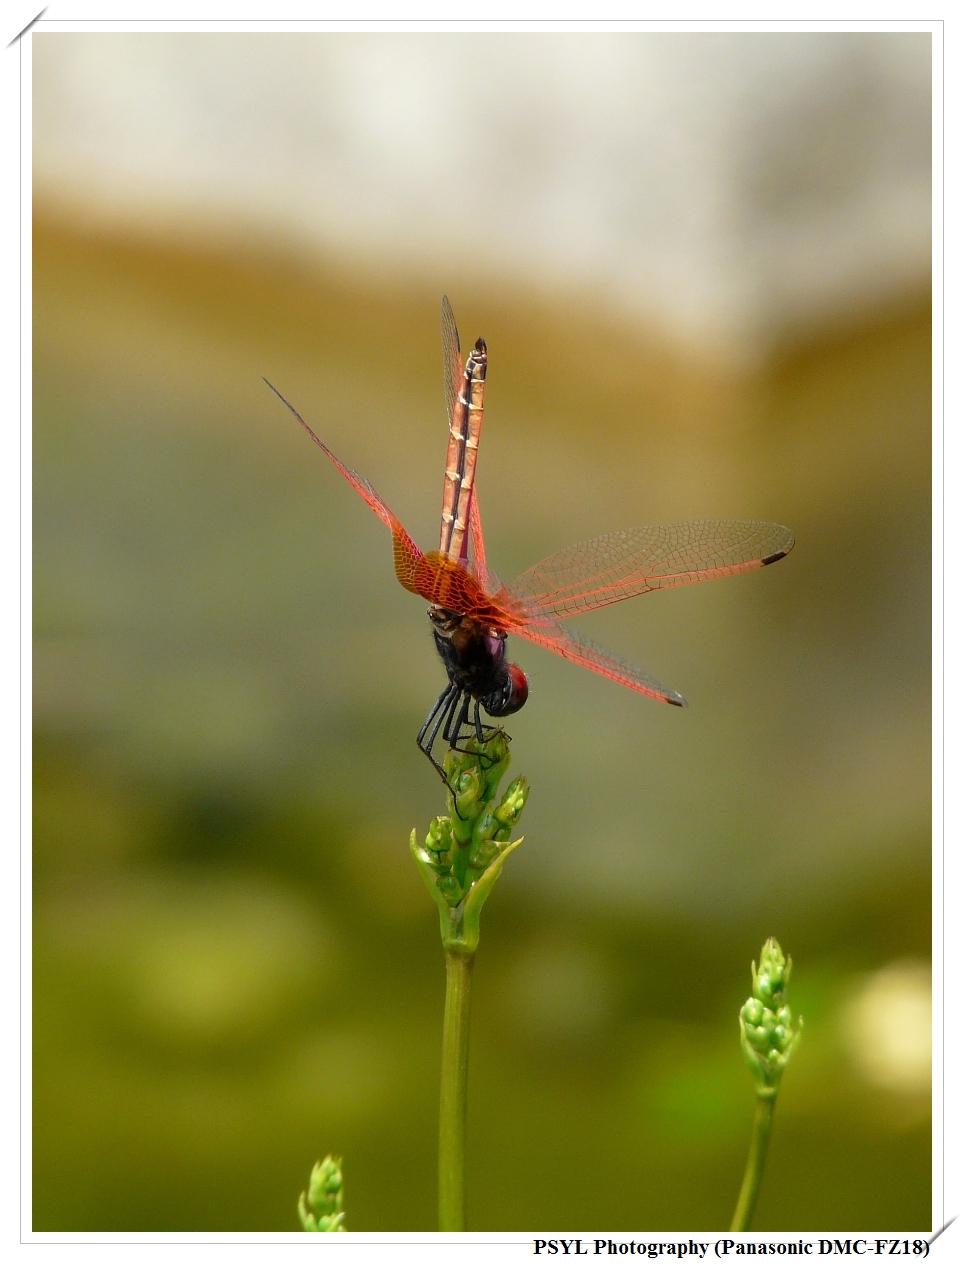 Scarlet Basker (Urothemis signata yiei) - 褐基蜻蜓